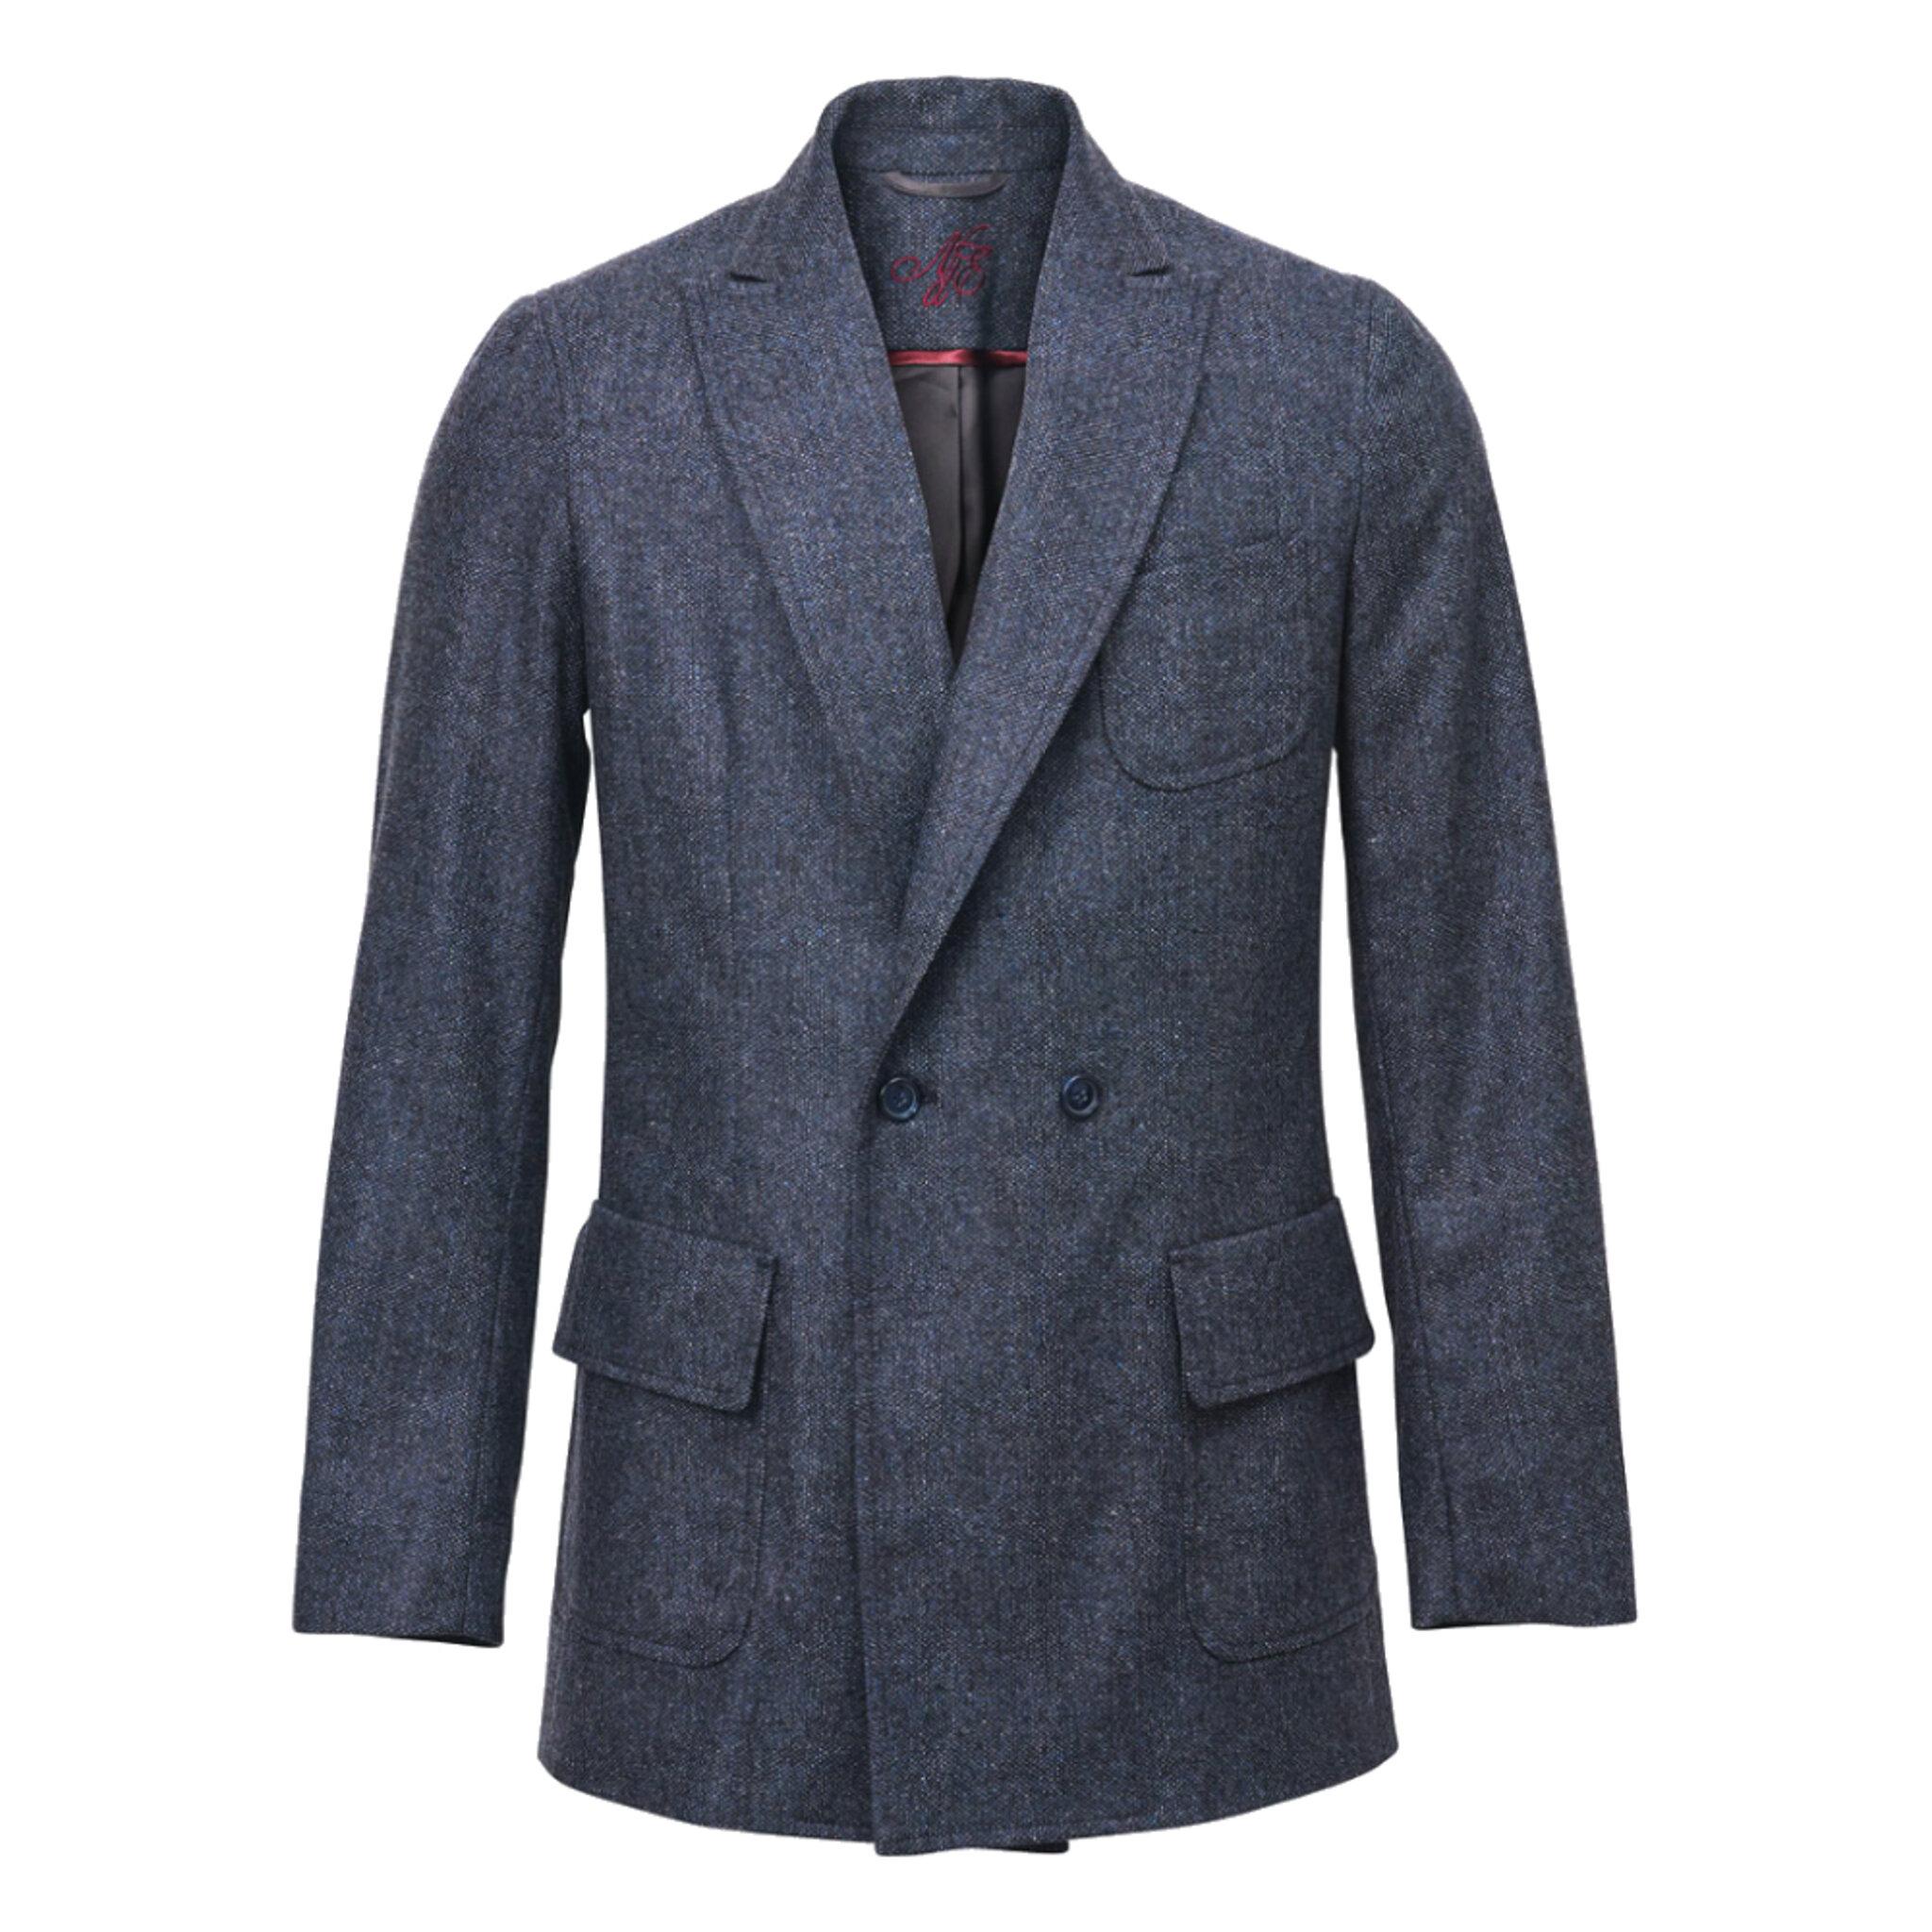 Ledgendary Double Breasted Wool Blazer